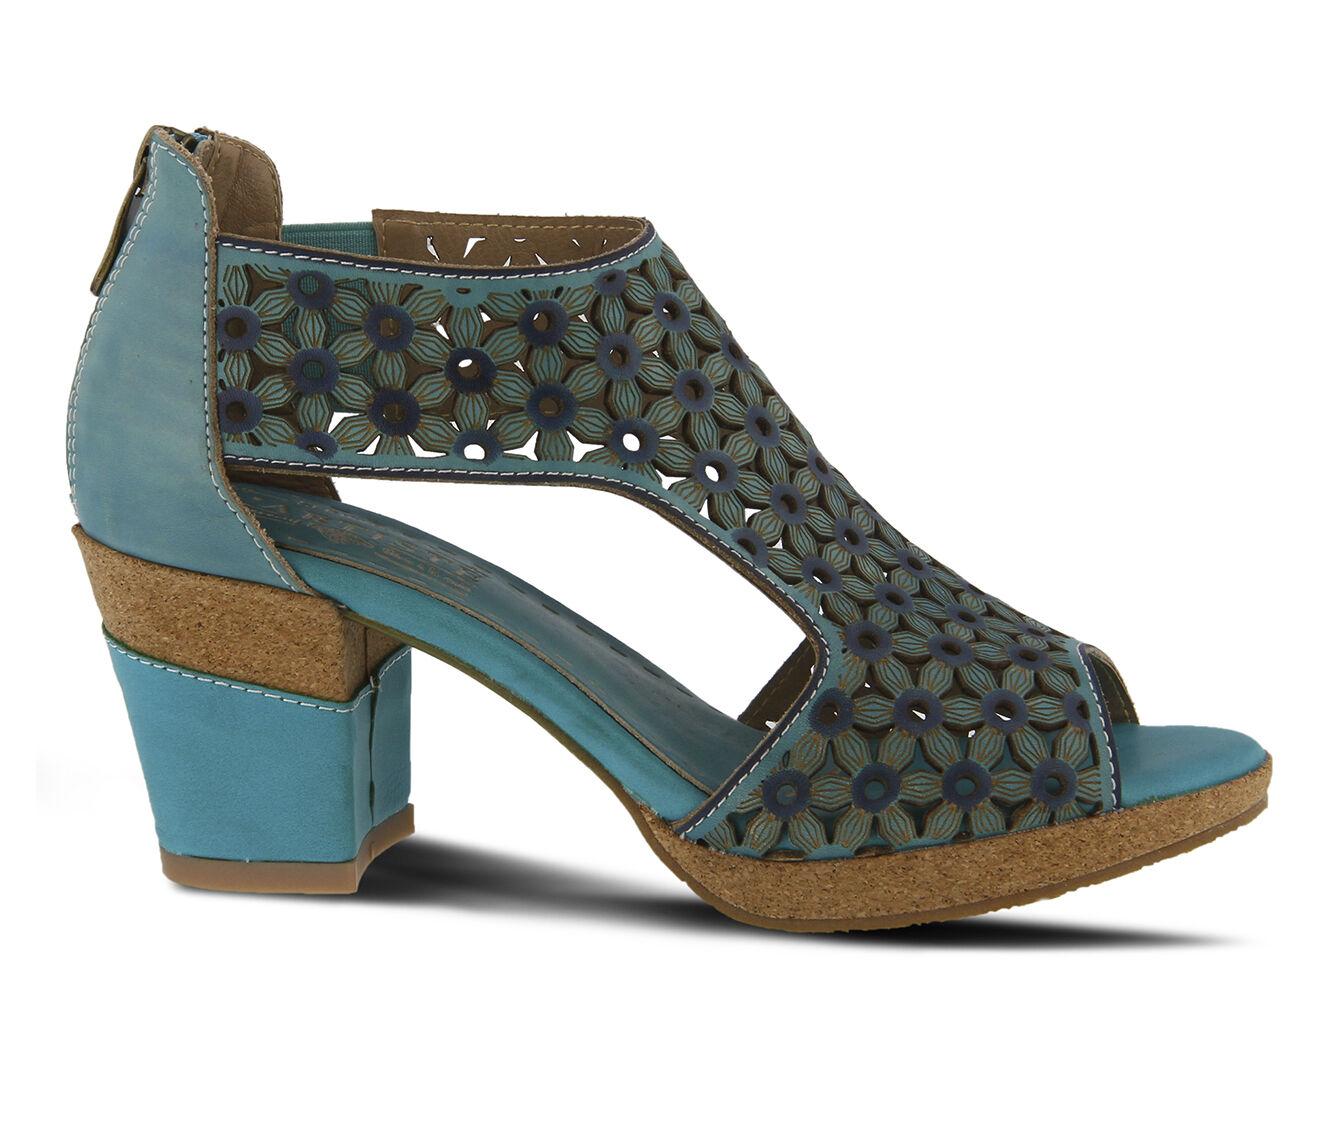 uk shoes_kd6206